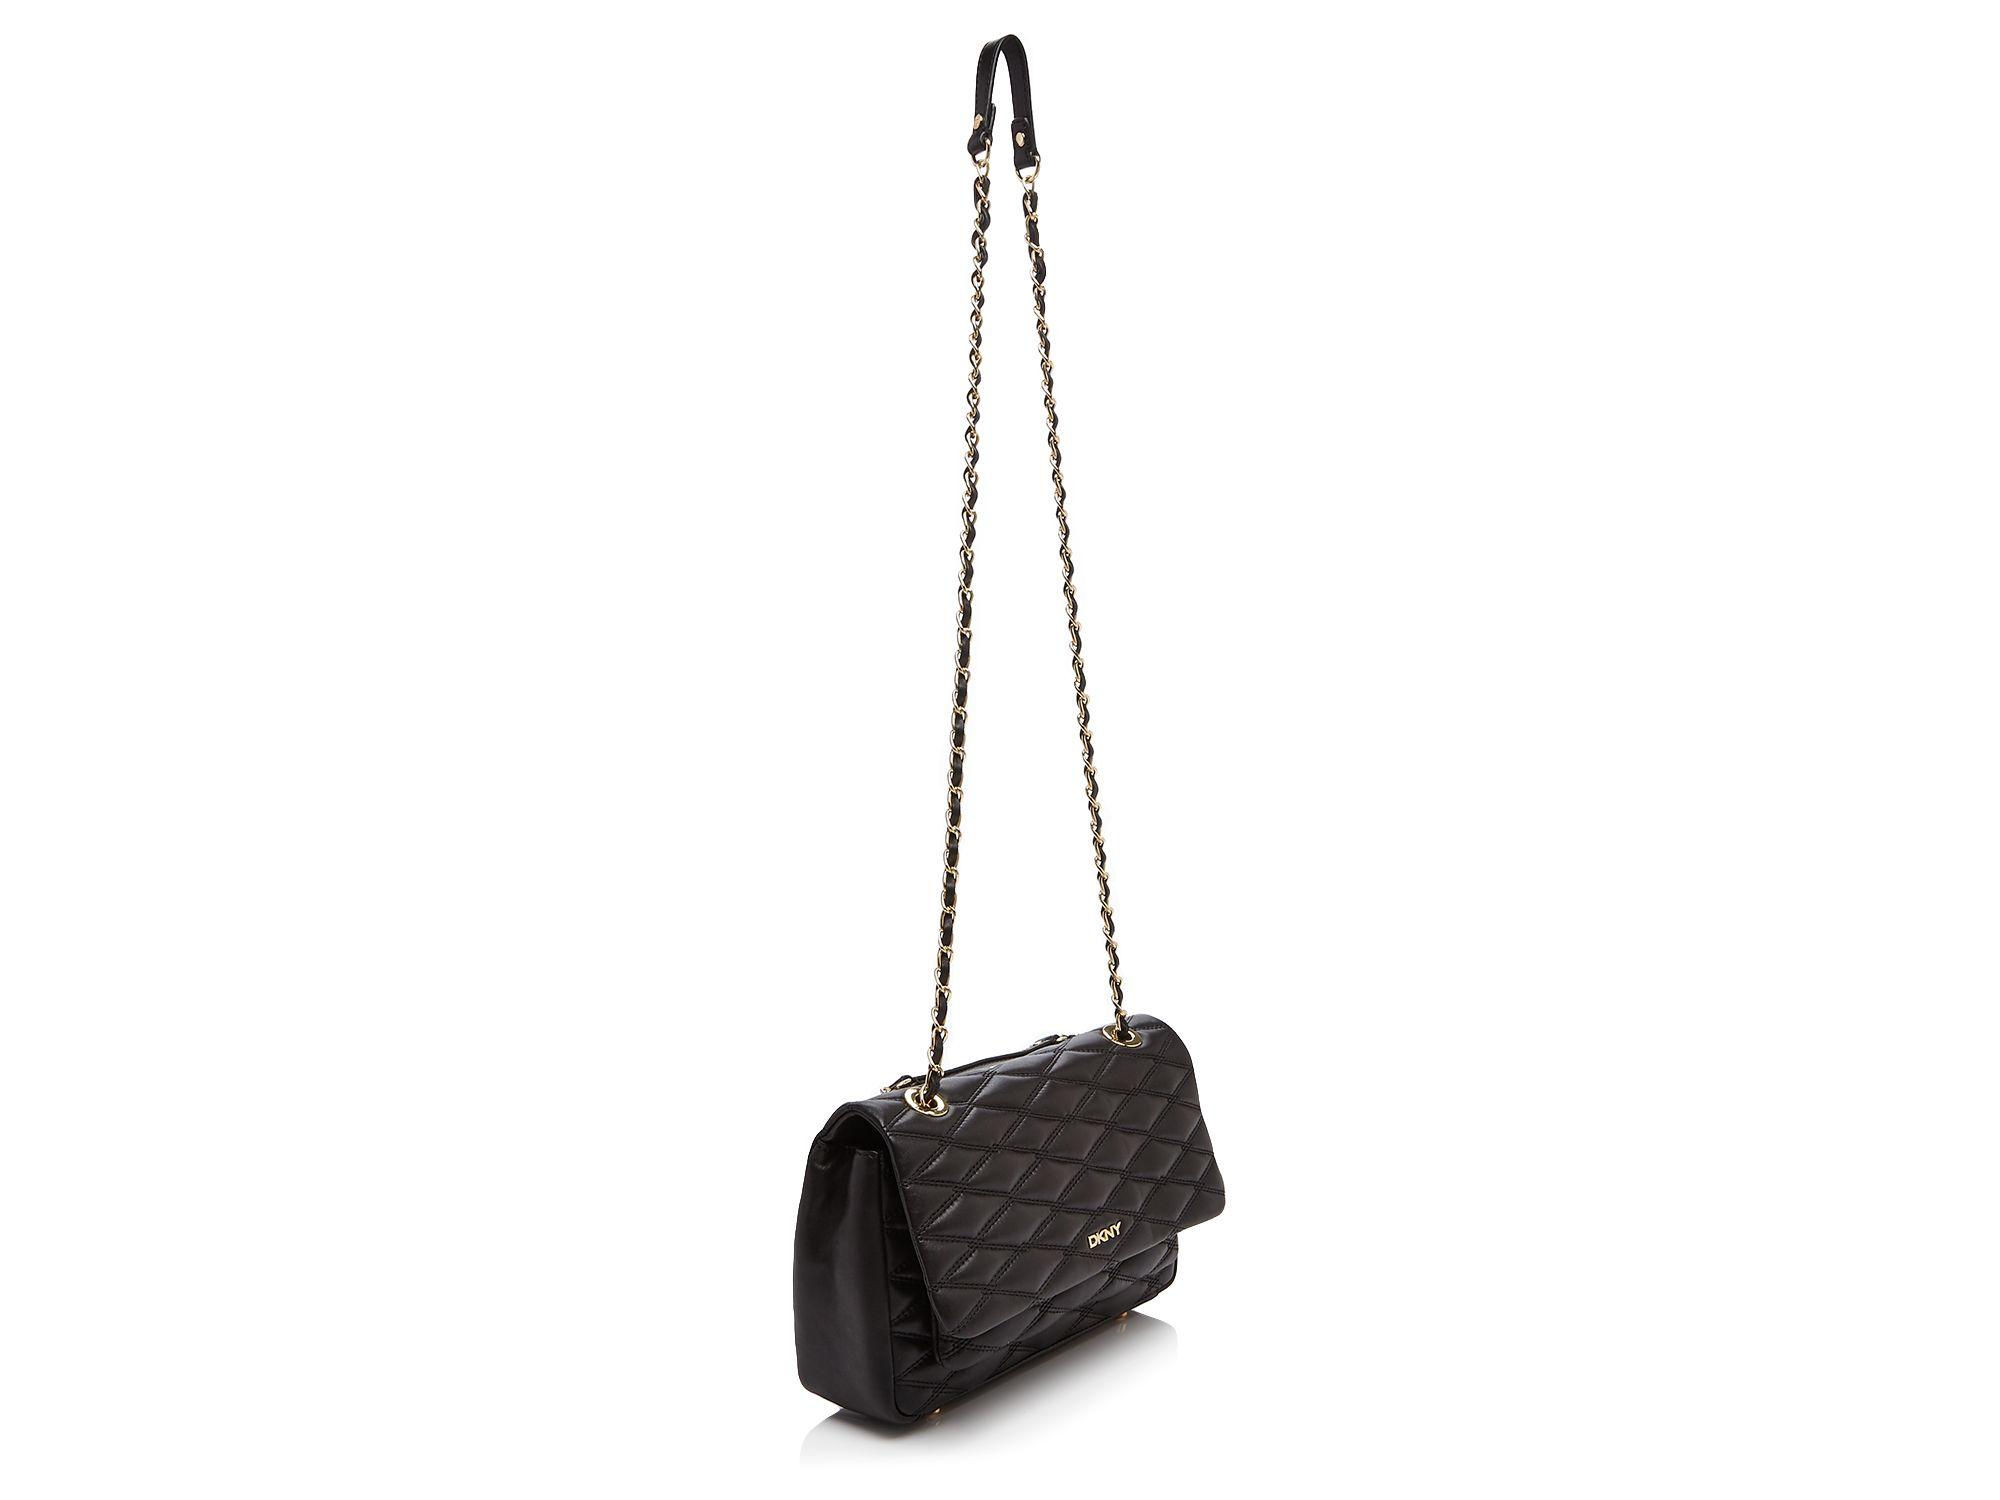 Dkny Gansevoort Quilted Nappa Flap Pocket Shoulder Bag in Natural ... : dkny quilted shoulder bag - Adamdwight.com